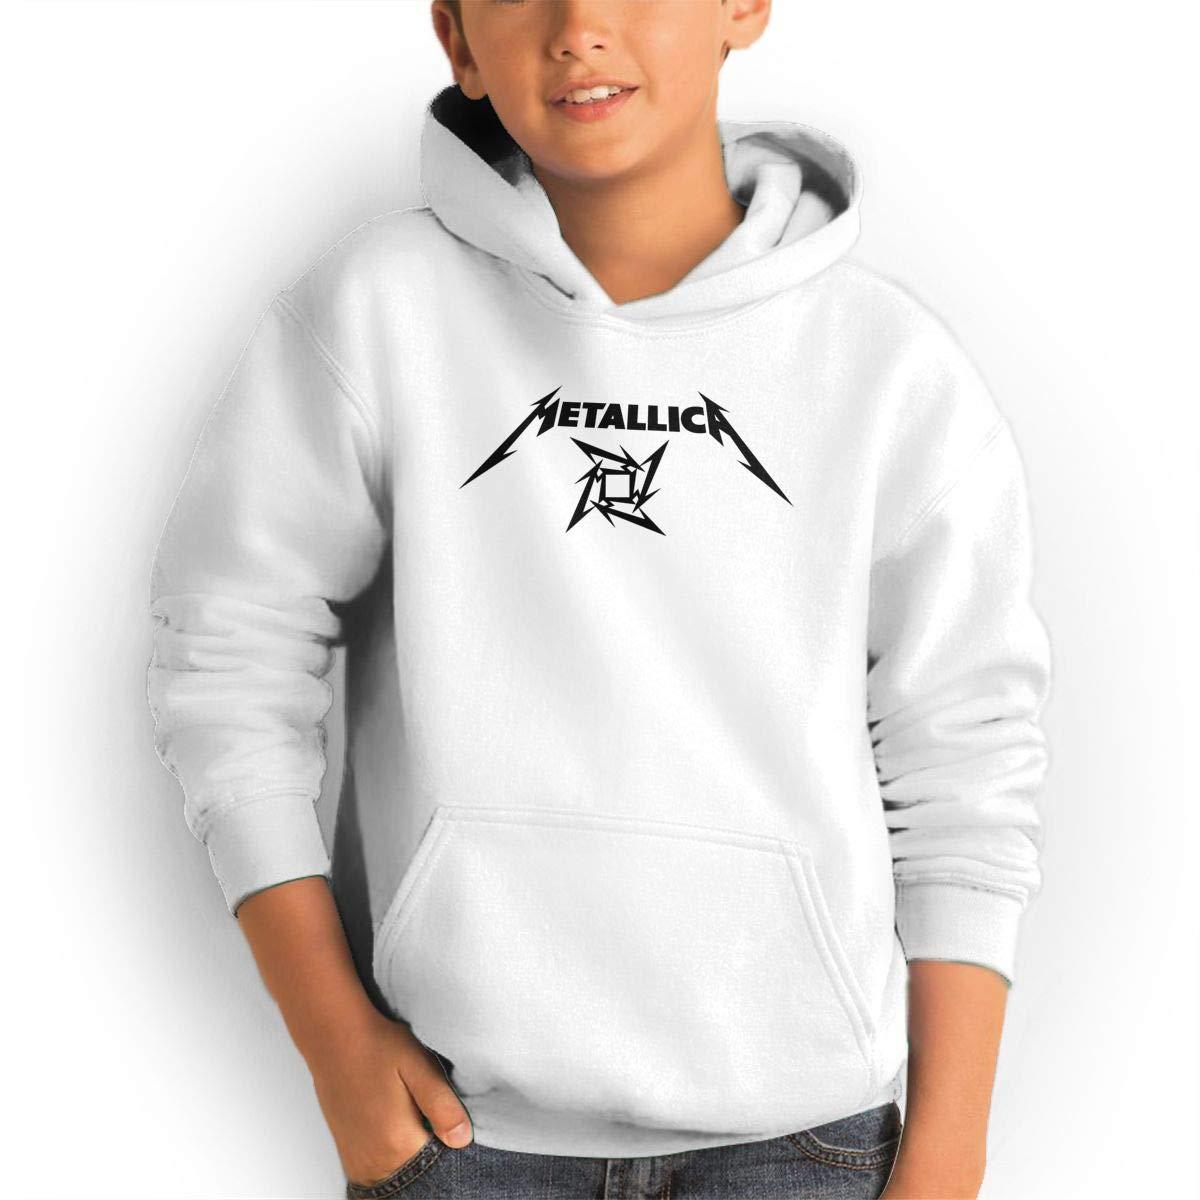 Richardmart Metallica And Girls Pullover Hood Shirts